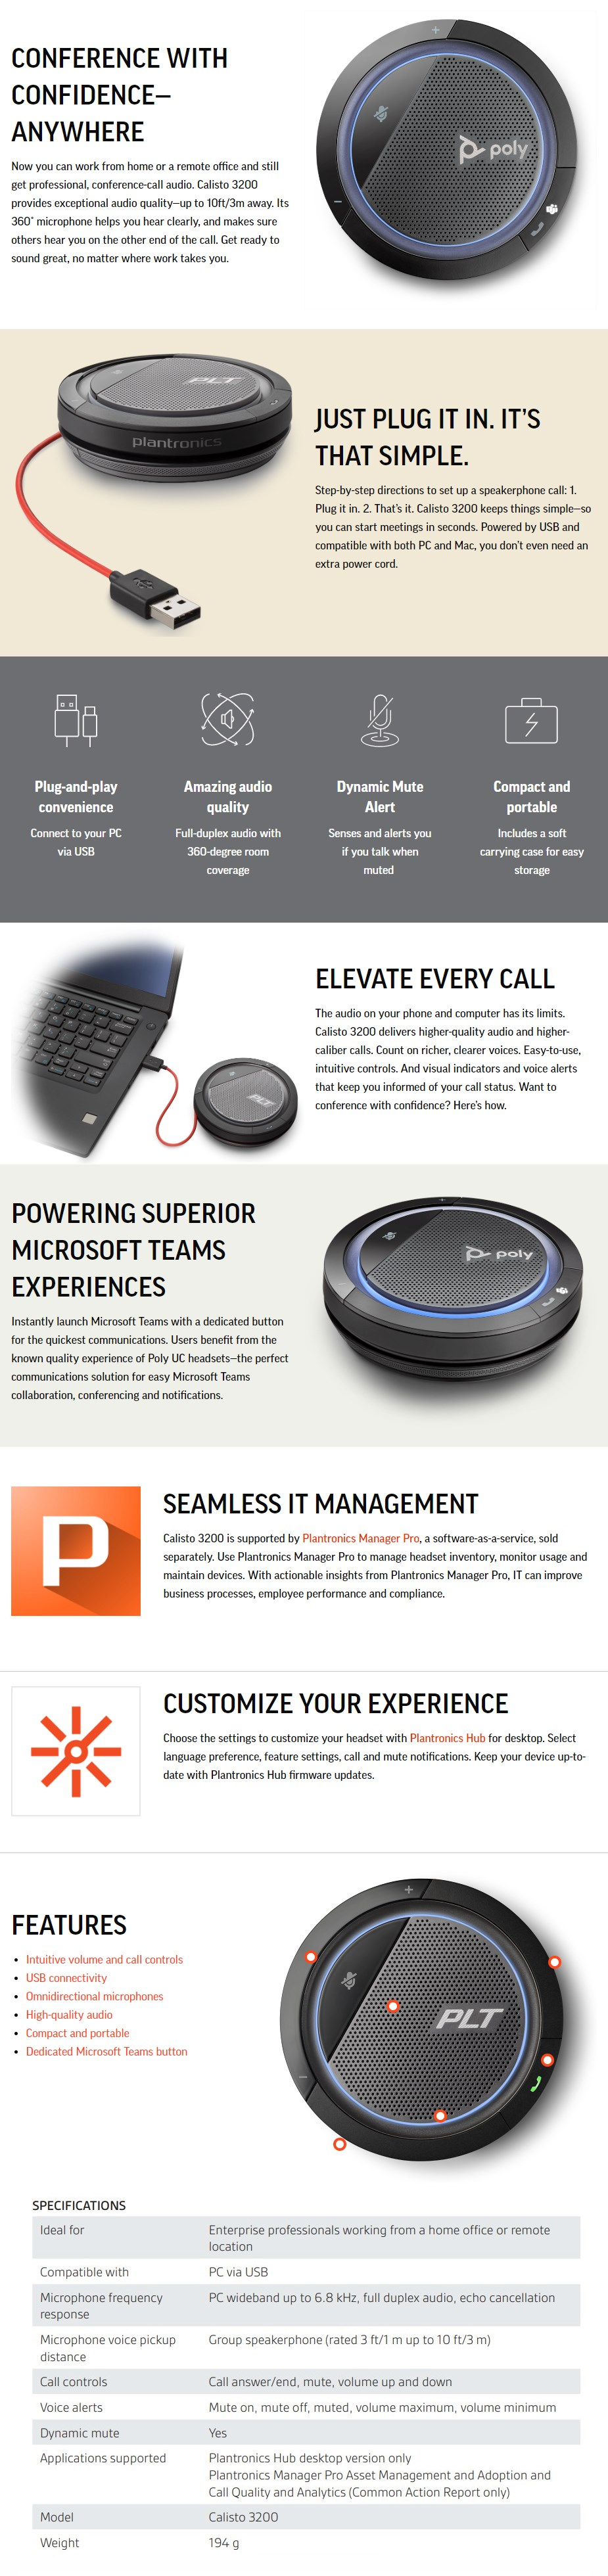 plantronics-calisto-3200-uc-usbaafa-portable-speakerphone-microsoft-teams-ac31045-2.jpg